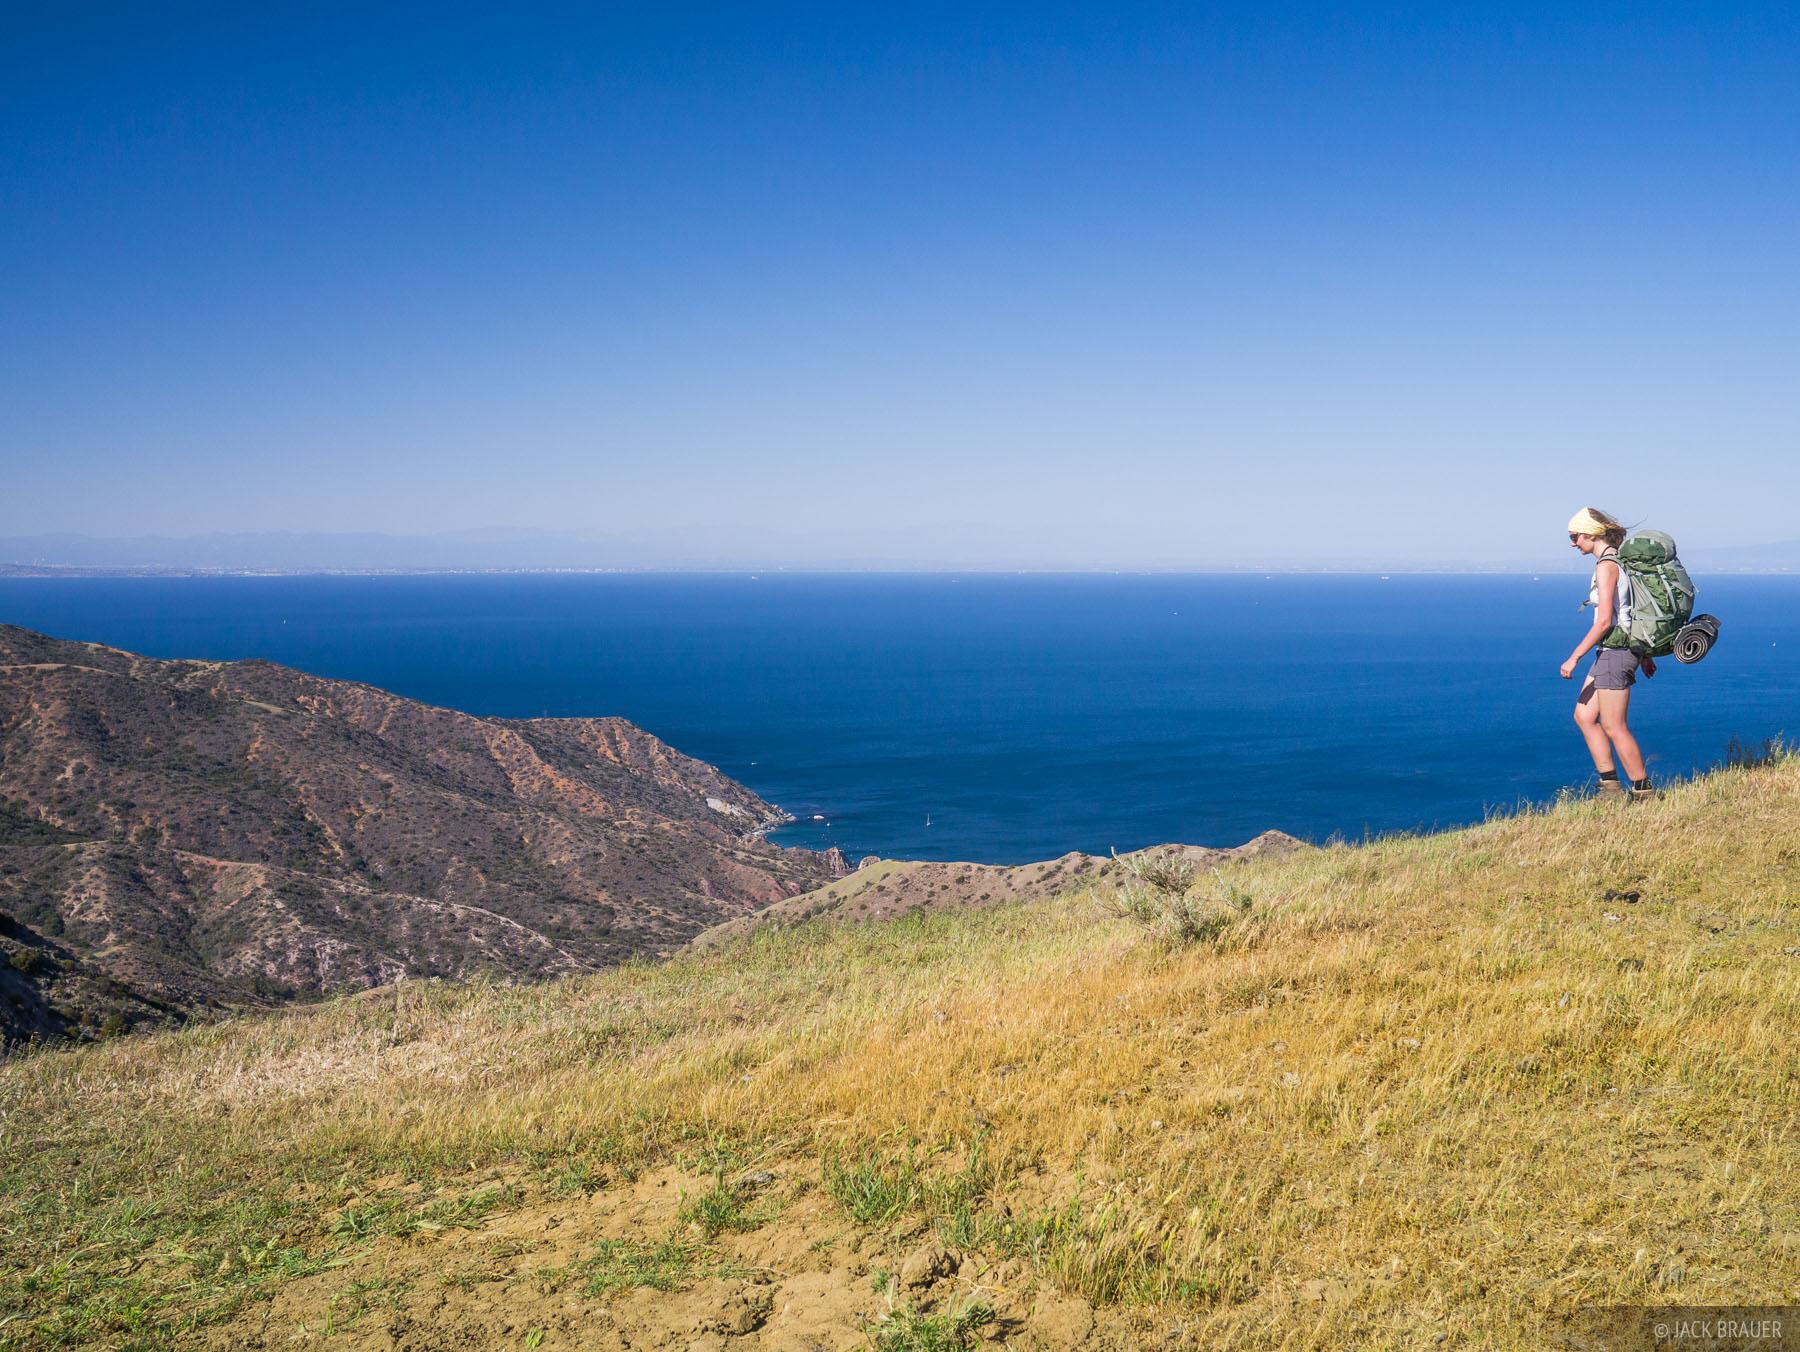 California, Catalina Island, Catalina, hiking, photo